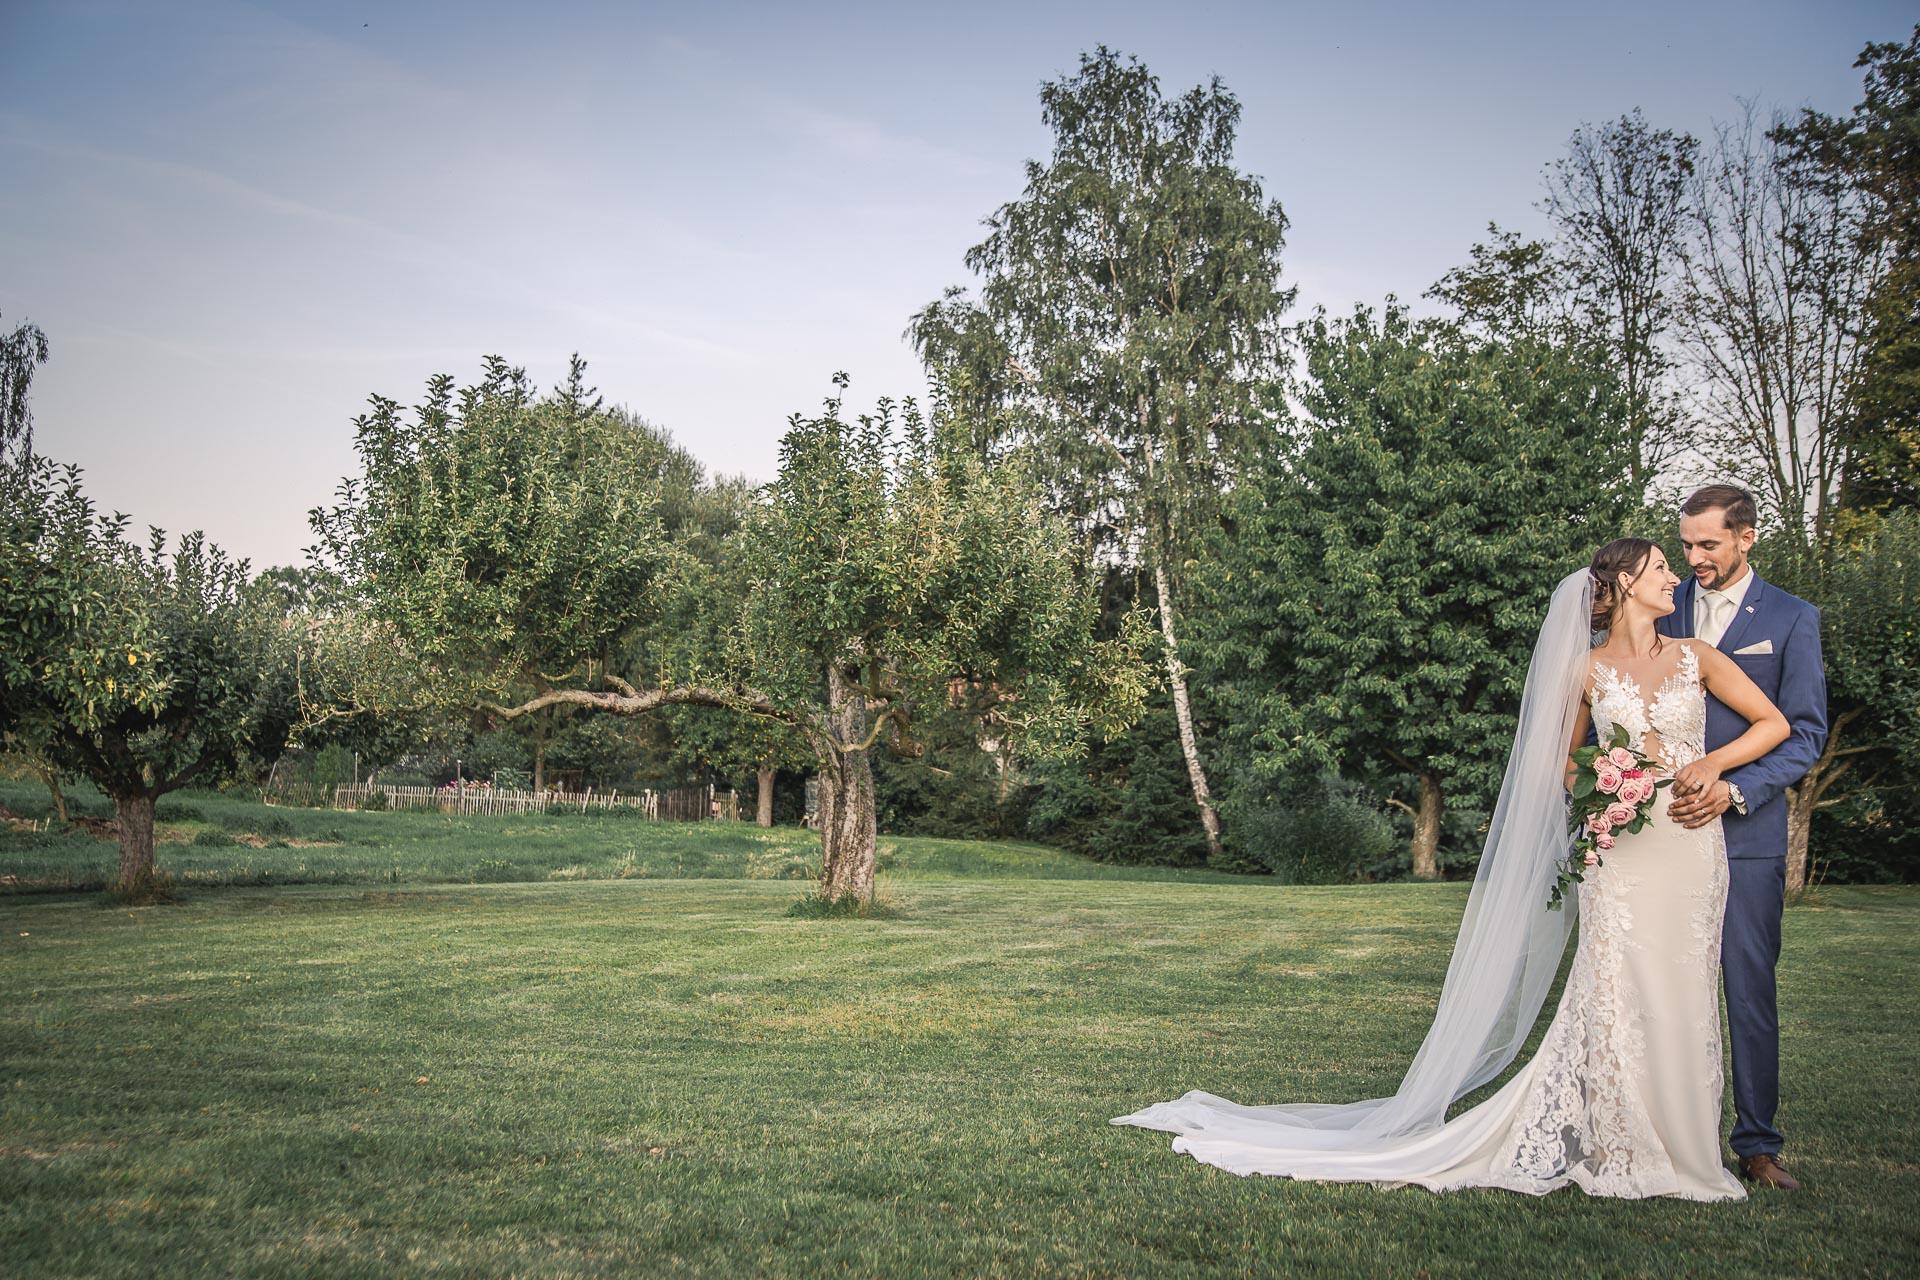 svatební-fotograf-wedding-svatebni-video-orlík-vltava-kostel-statek-stodola-boho-svatba-Beautyfoto-522